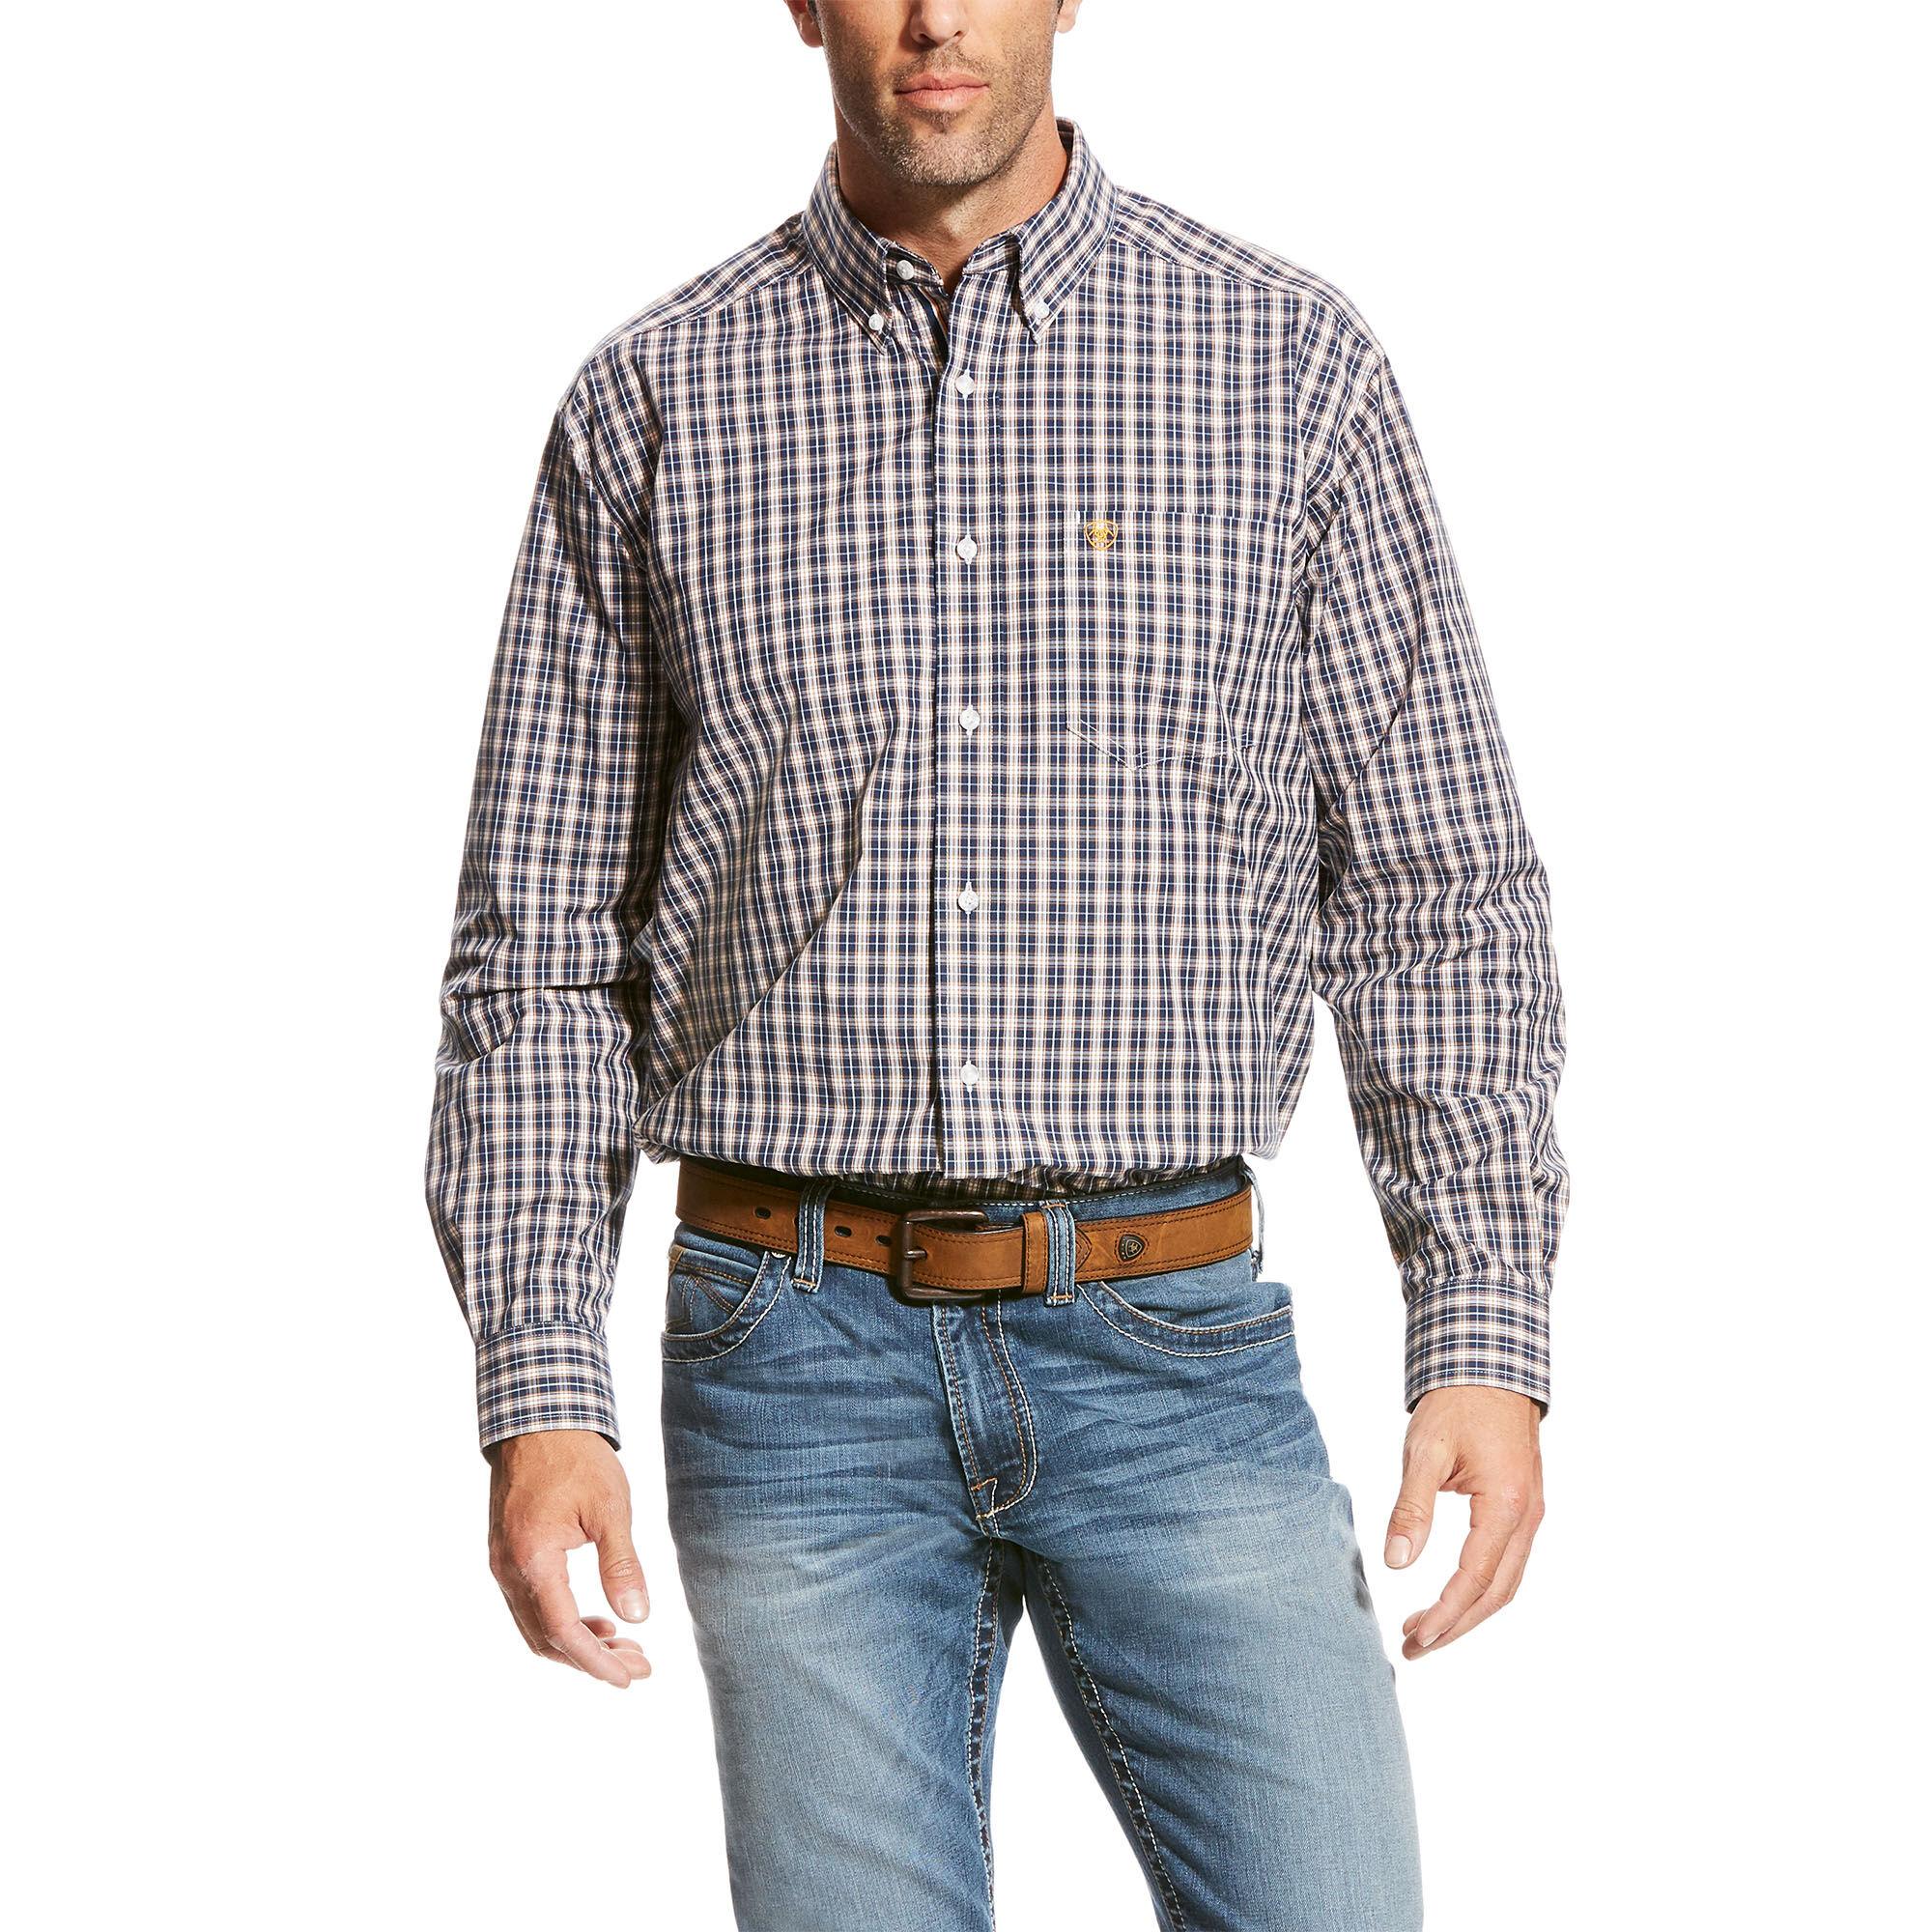 Pro Series Vahl Shirt